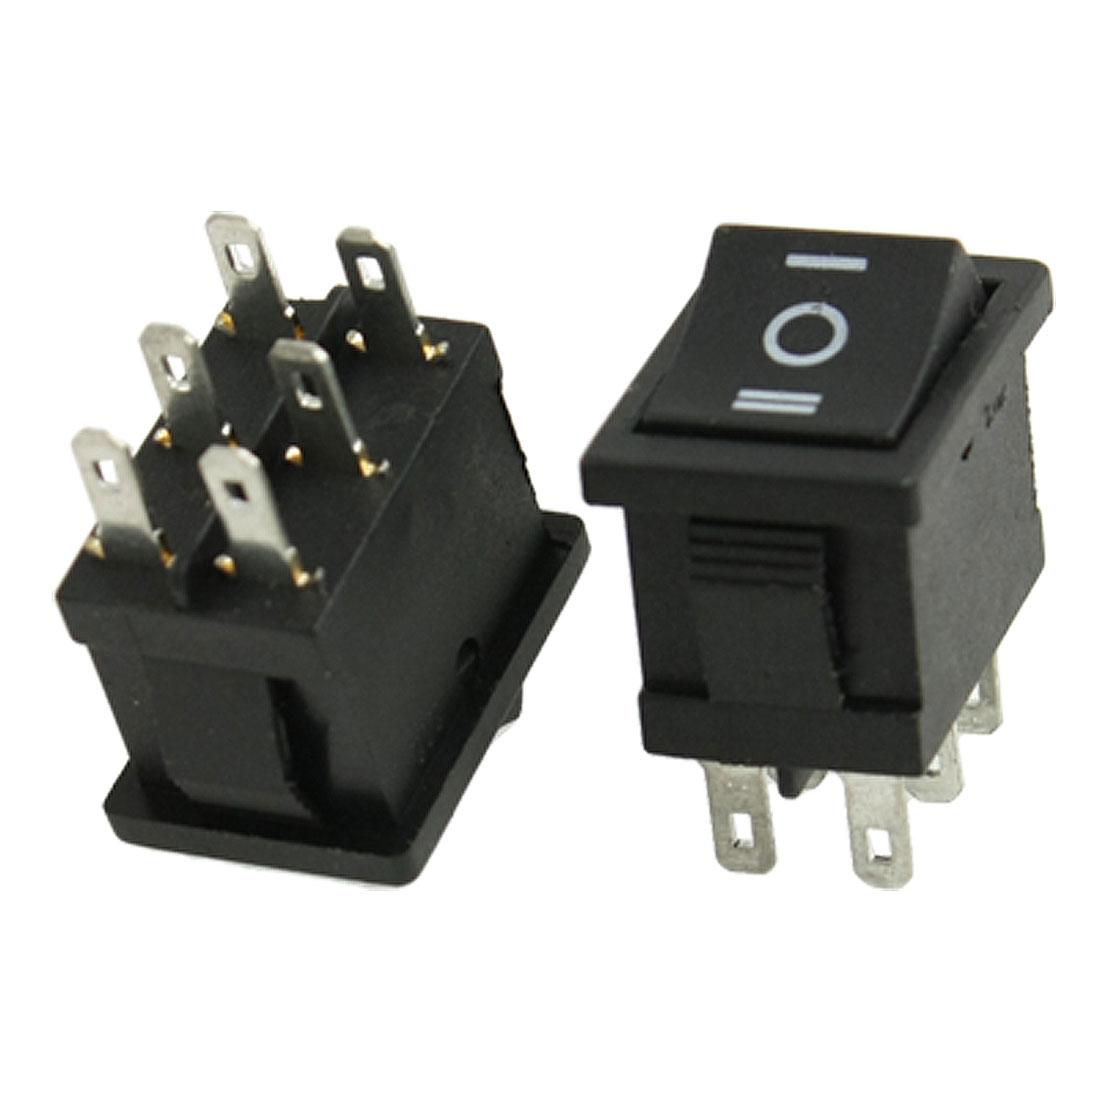 5 Pcs 6 Pin DPDT ON-OFF-ON 3 Position Snap in Rocker Switch 6A/250V 10A/125V AC